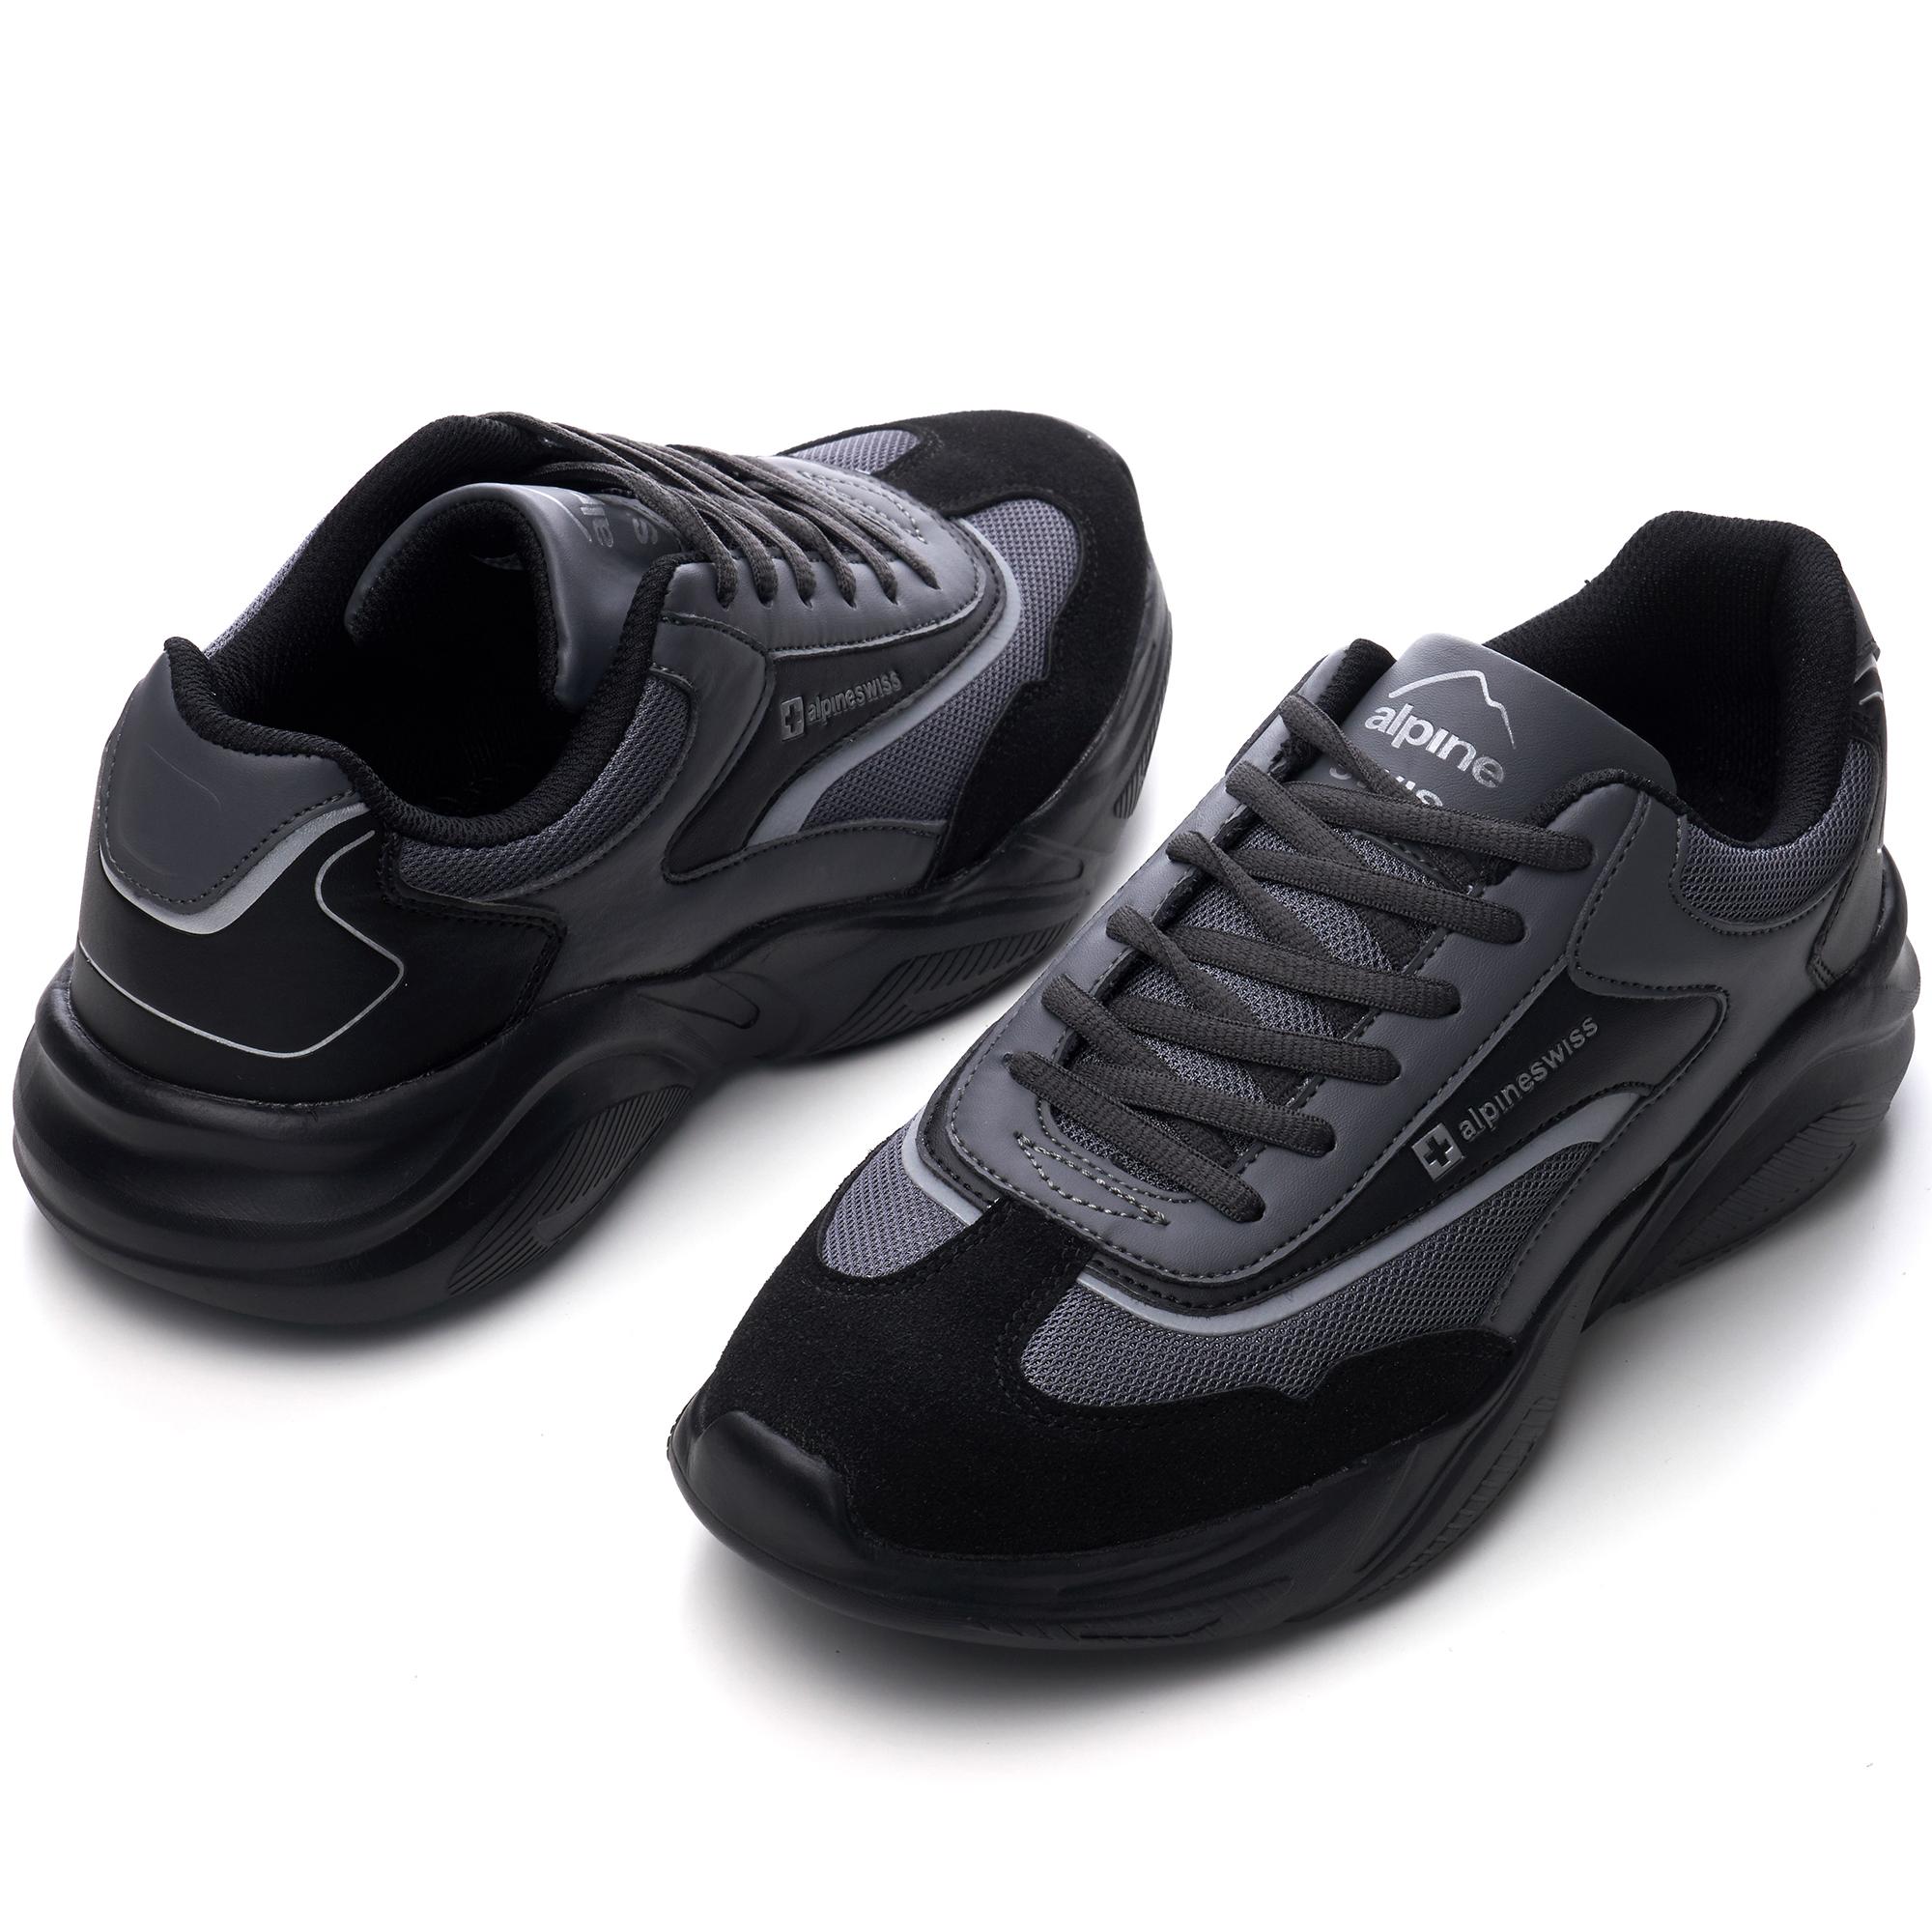 Alpine-Swiss-Stuart-Mens-Chunky-Sneakers-Retro-Platform-Dad-Tennis-Shoes thumbnail 15